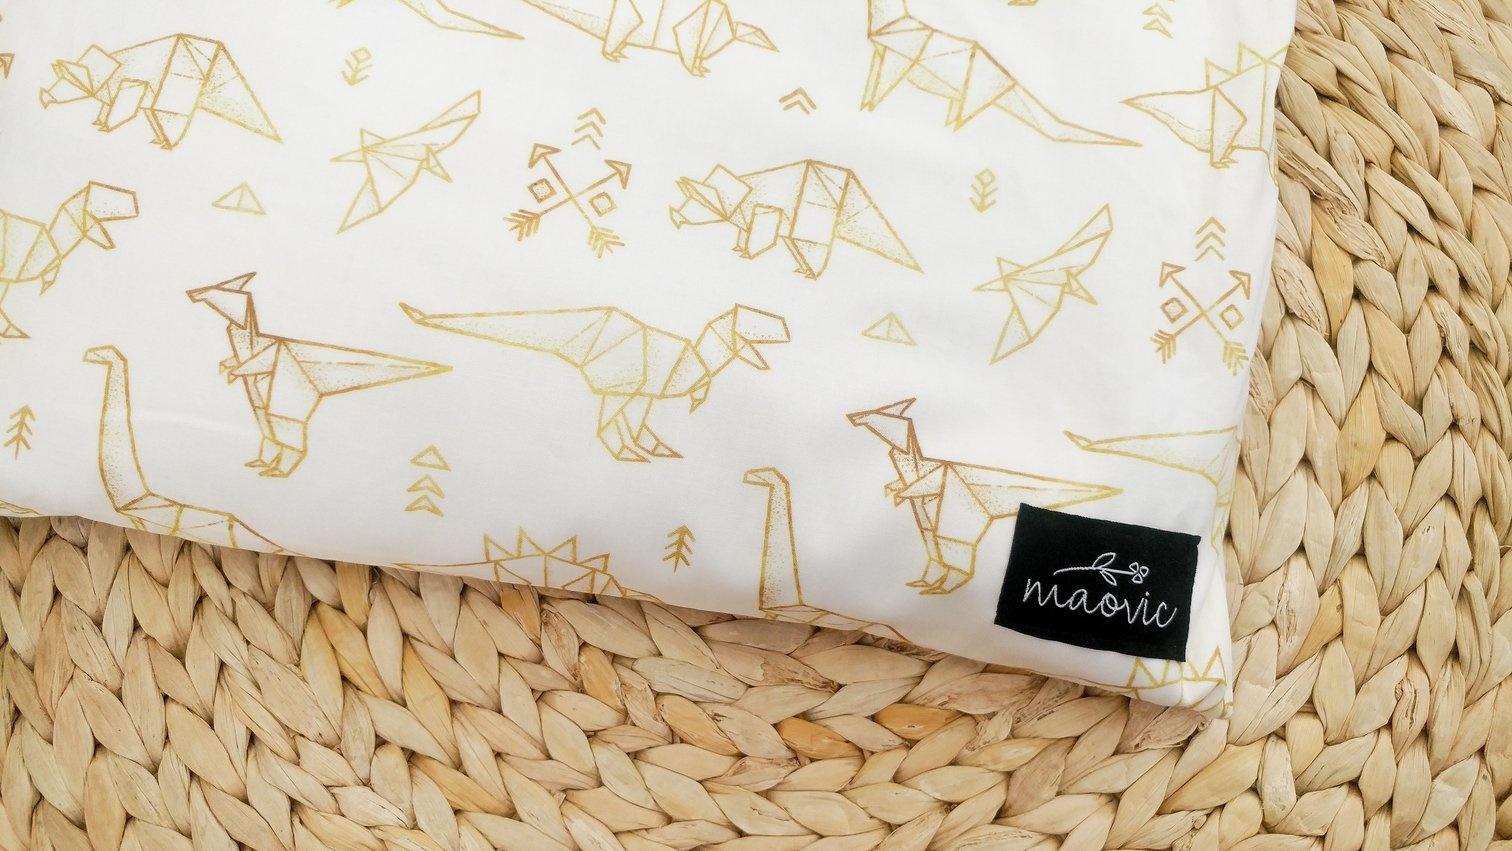 Maovic Buckwheat toddler pillow Dino Origami